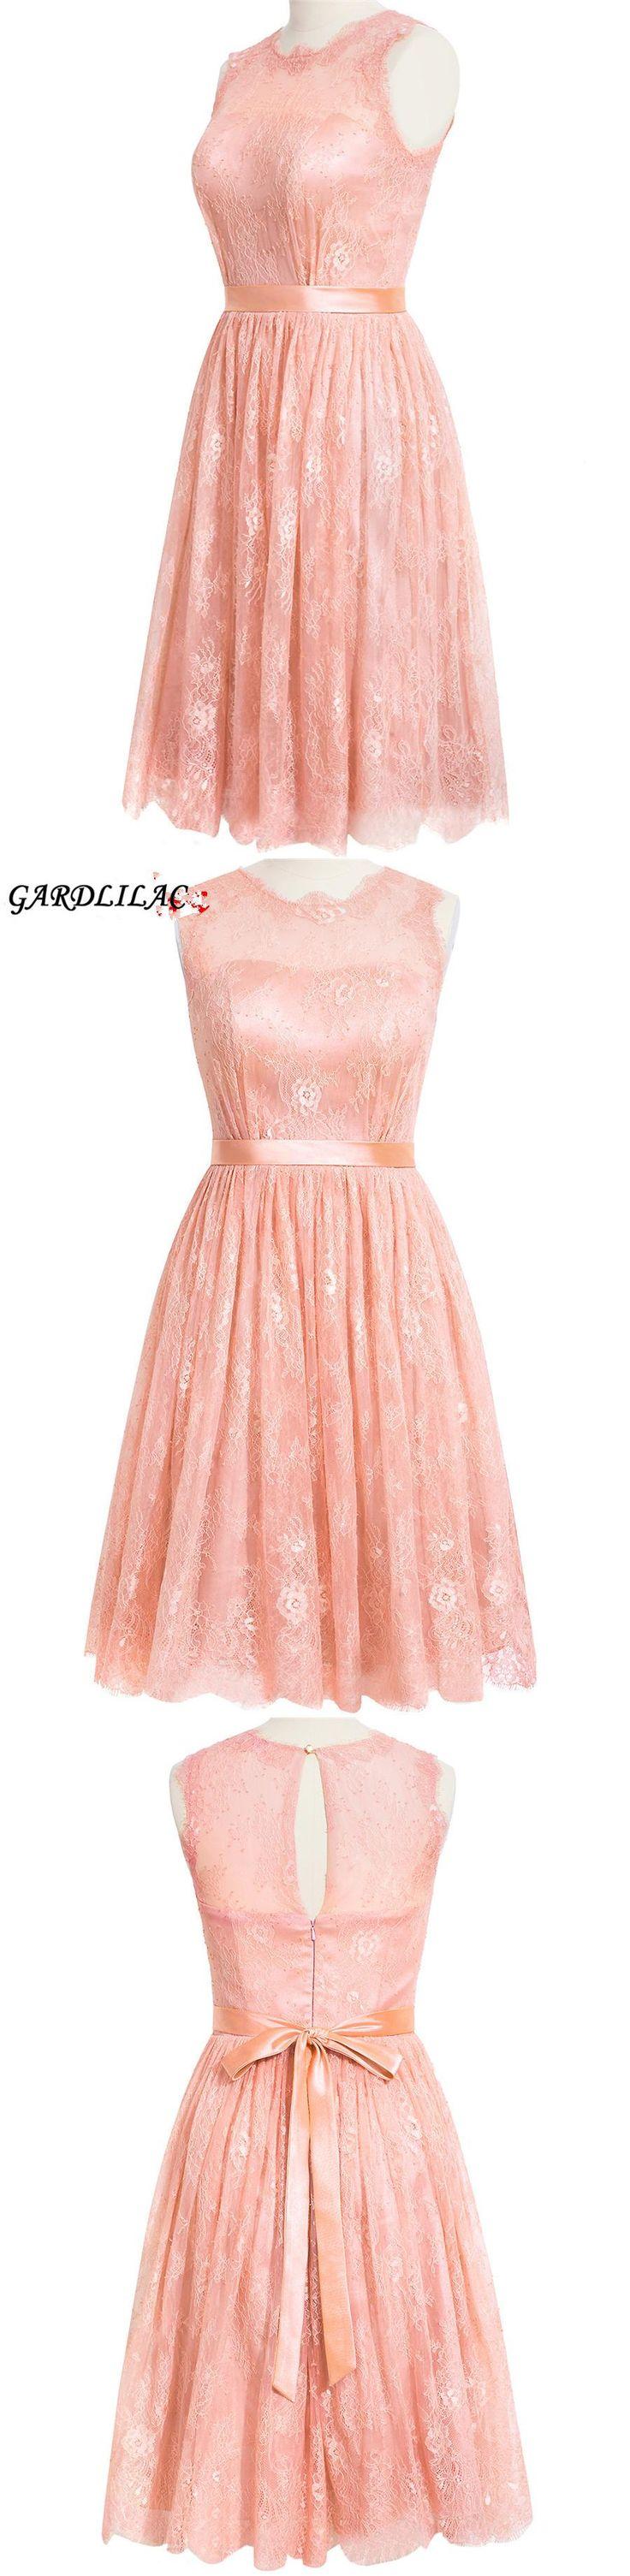 Mejores 22 imágenes de Wedding Party Dress en Pinterest | Fiestas de ...